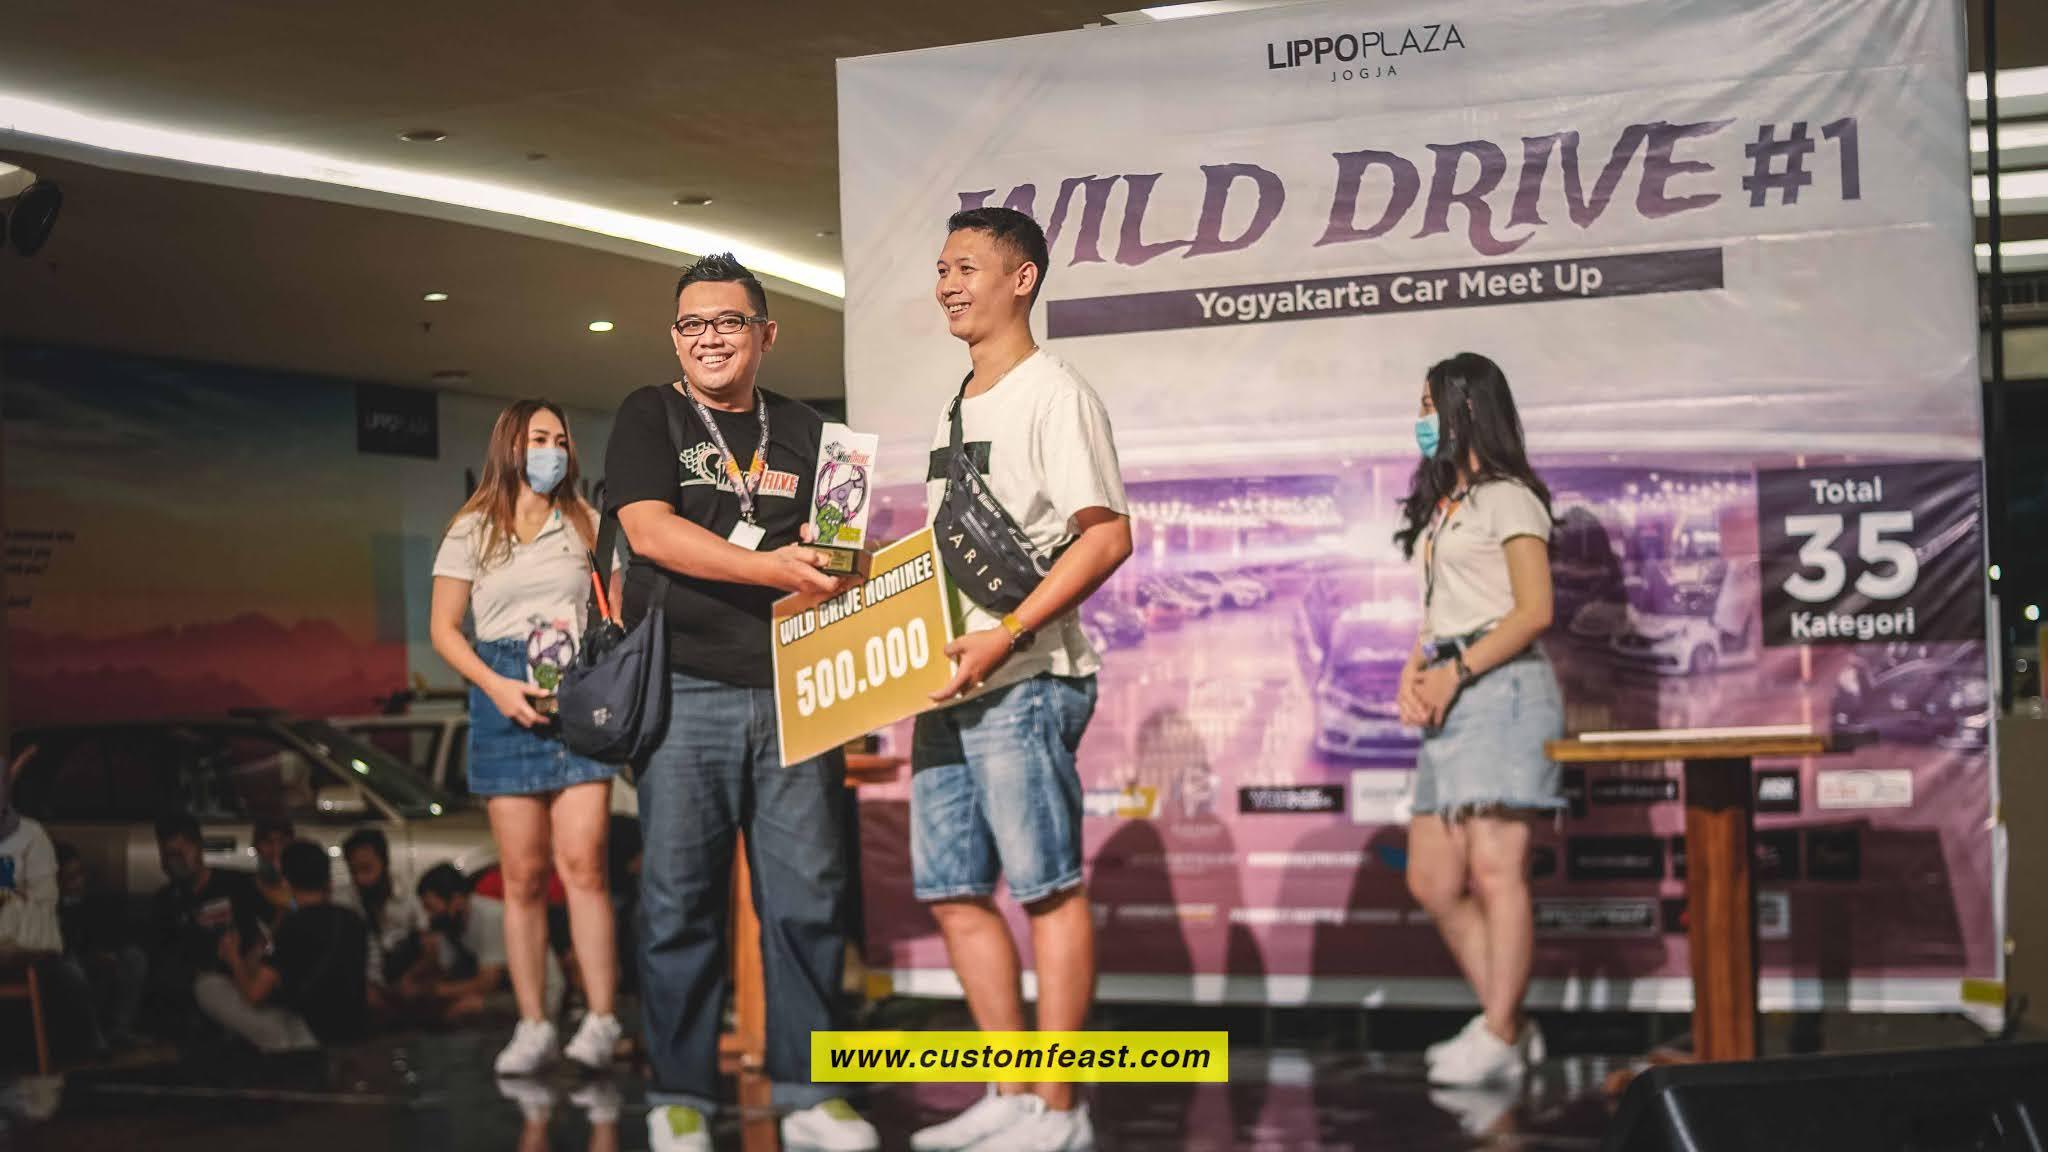 Wild Drive Car Contest